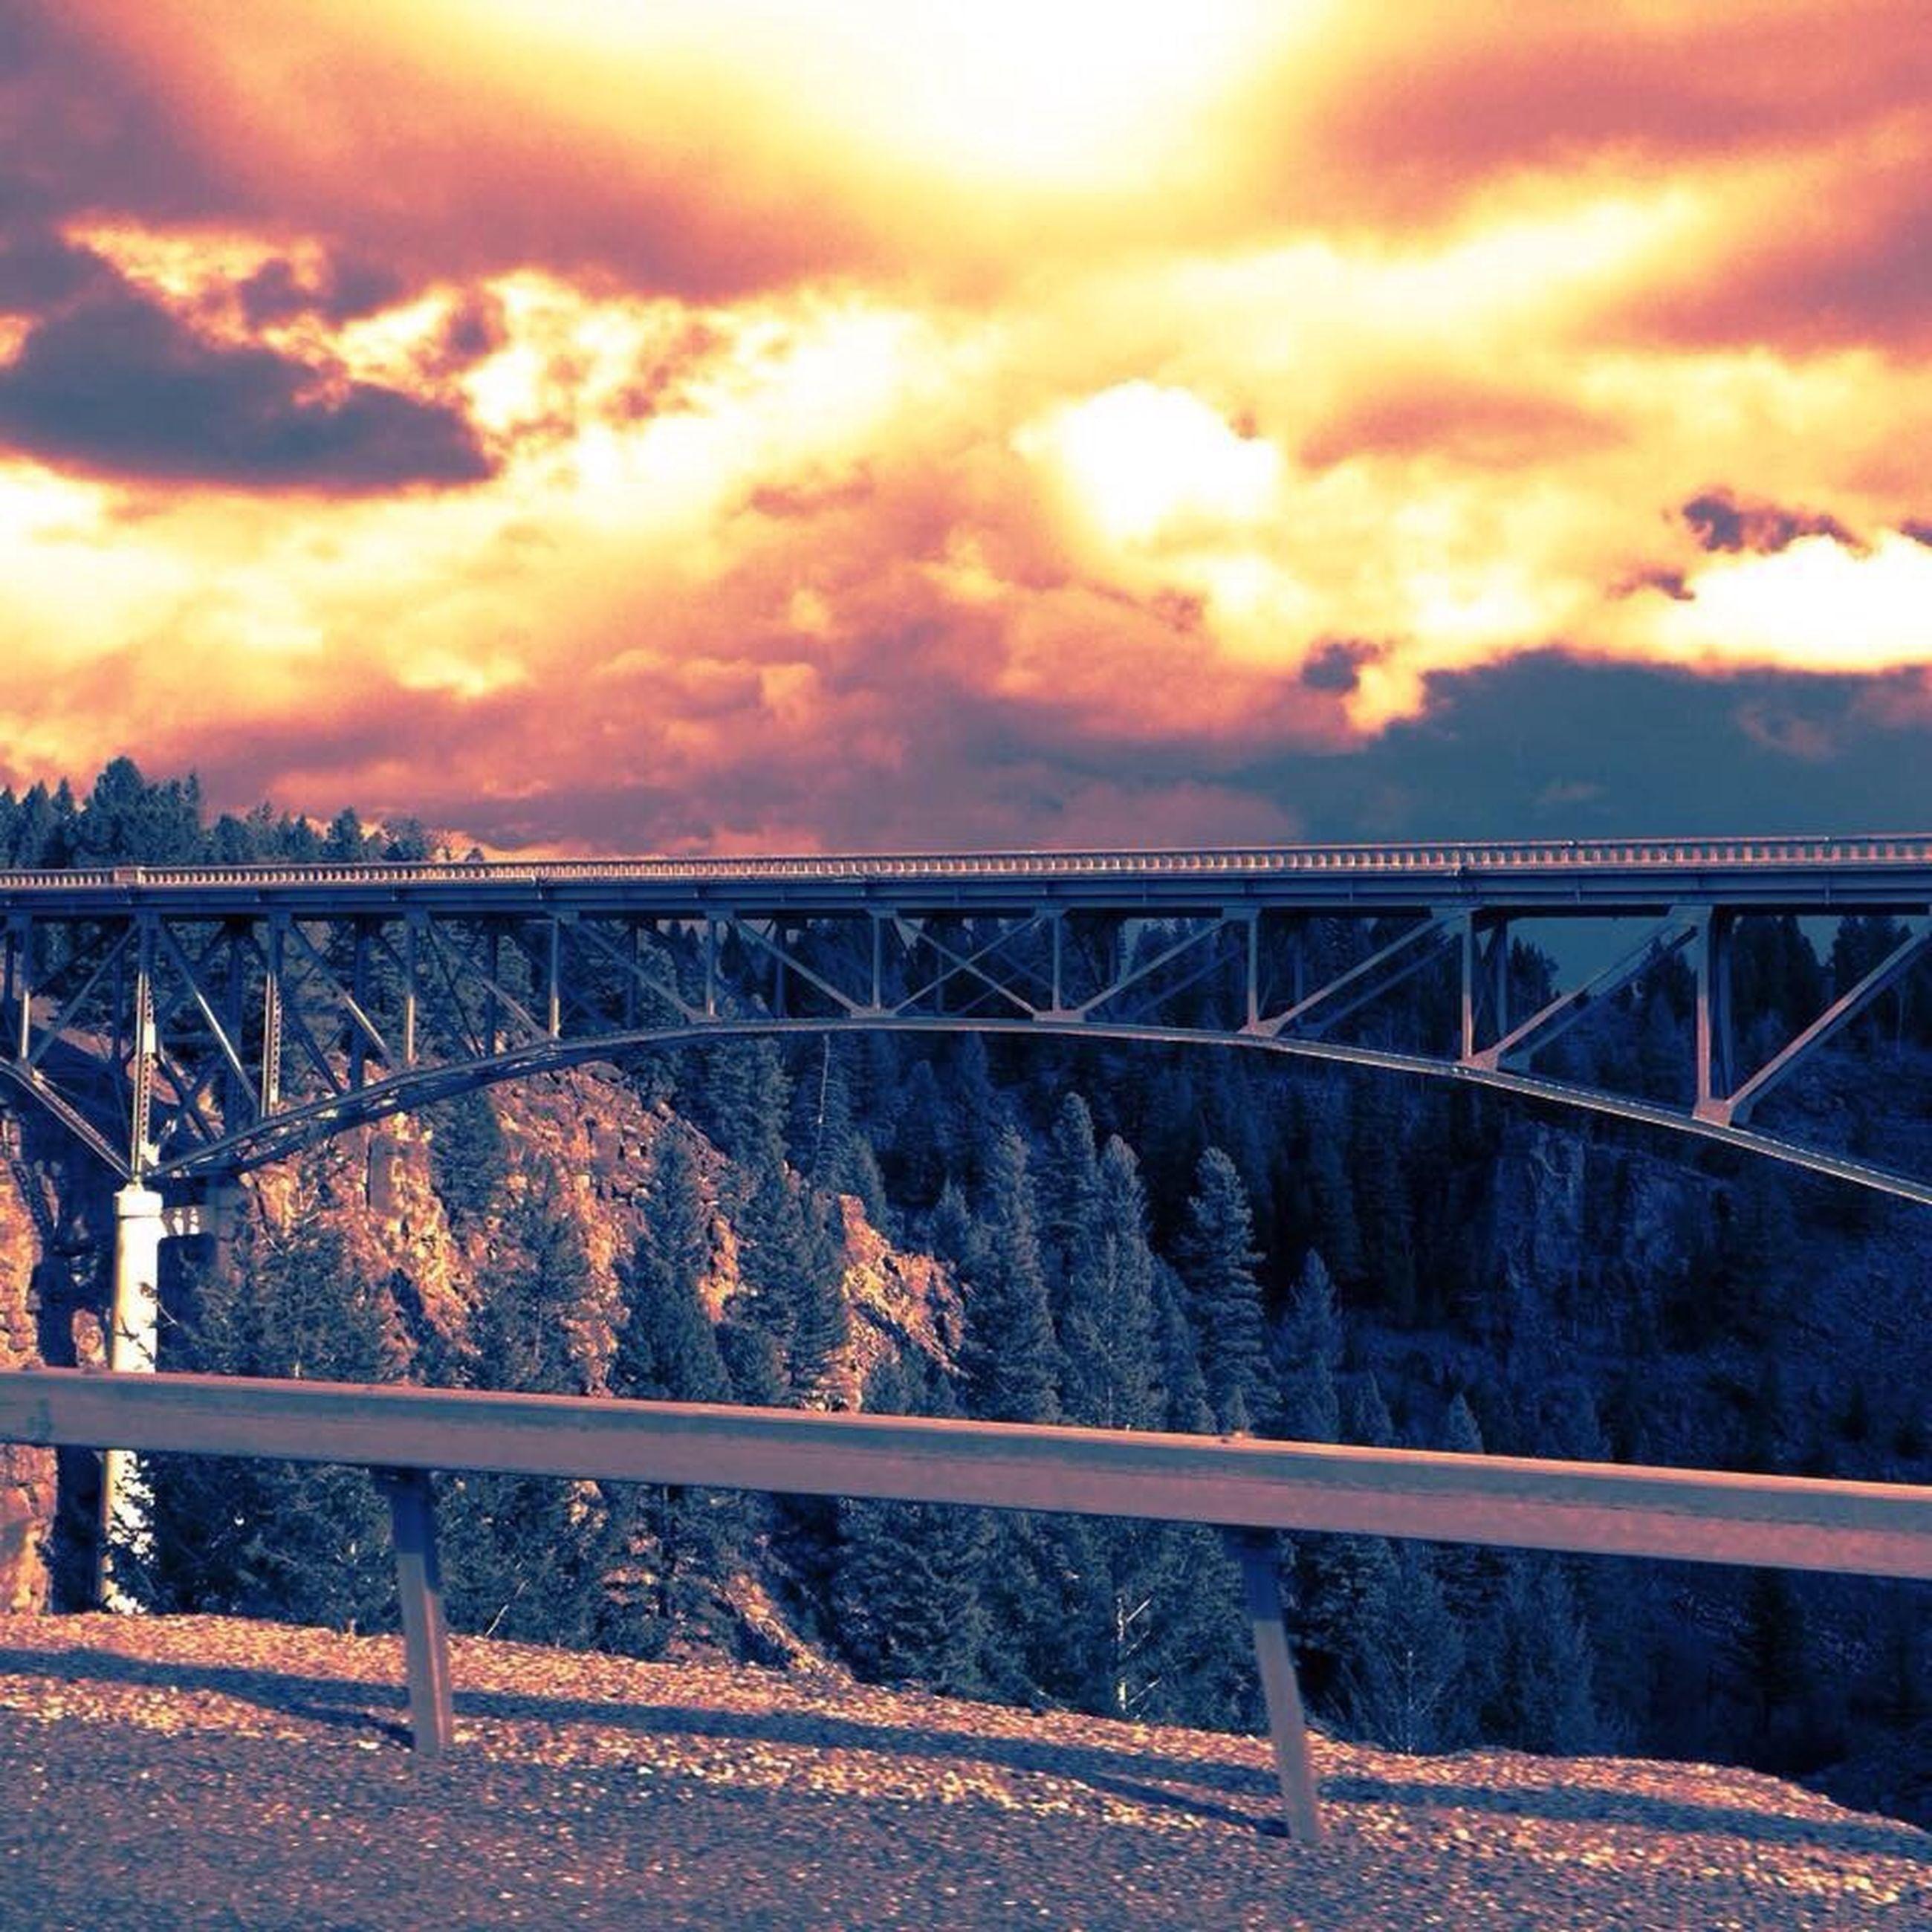 sunset, bridge - man made structure, sky, cloud - sky, connection, orange color, railing, transportation, cloudy, built structure, architecture, bridge, cloud, dramatic sky, rail transportation, metal, railroad track, engineering, nature, no people